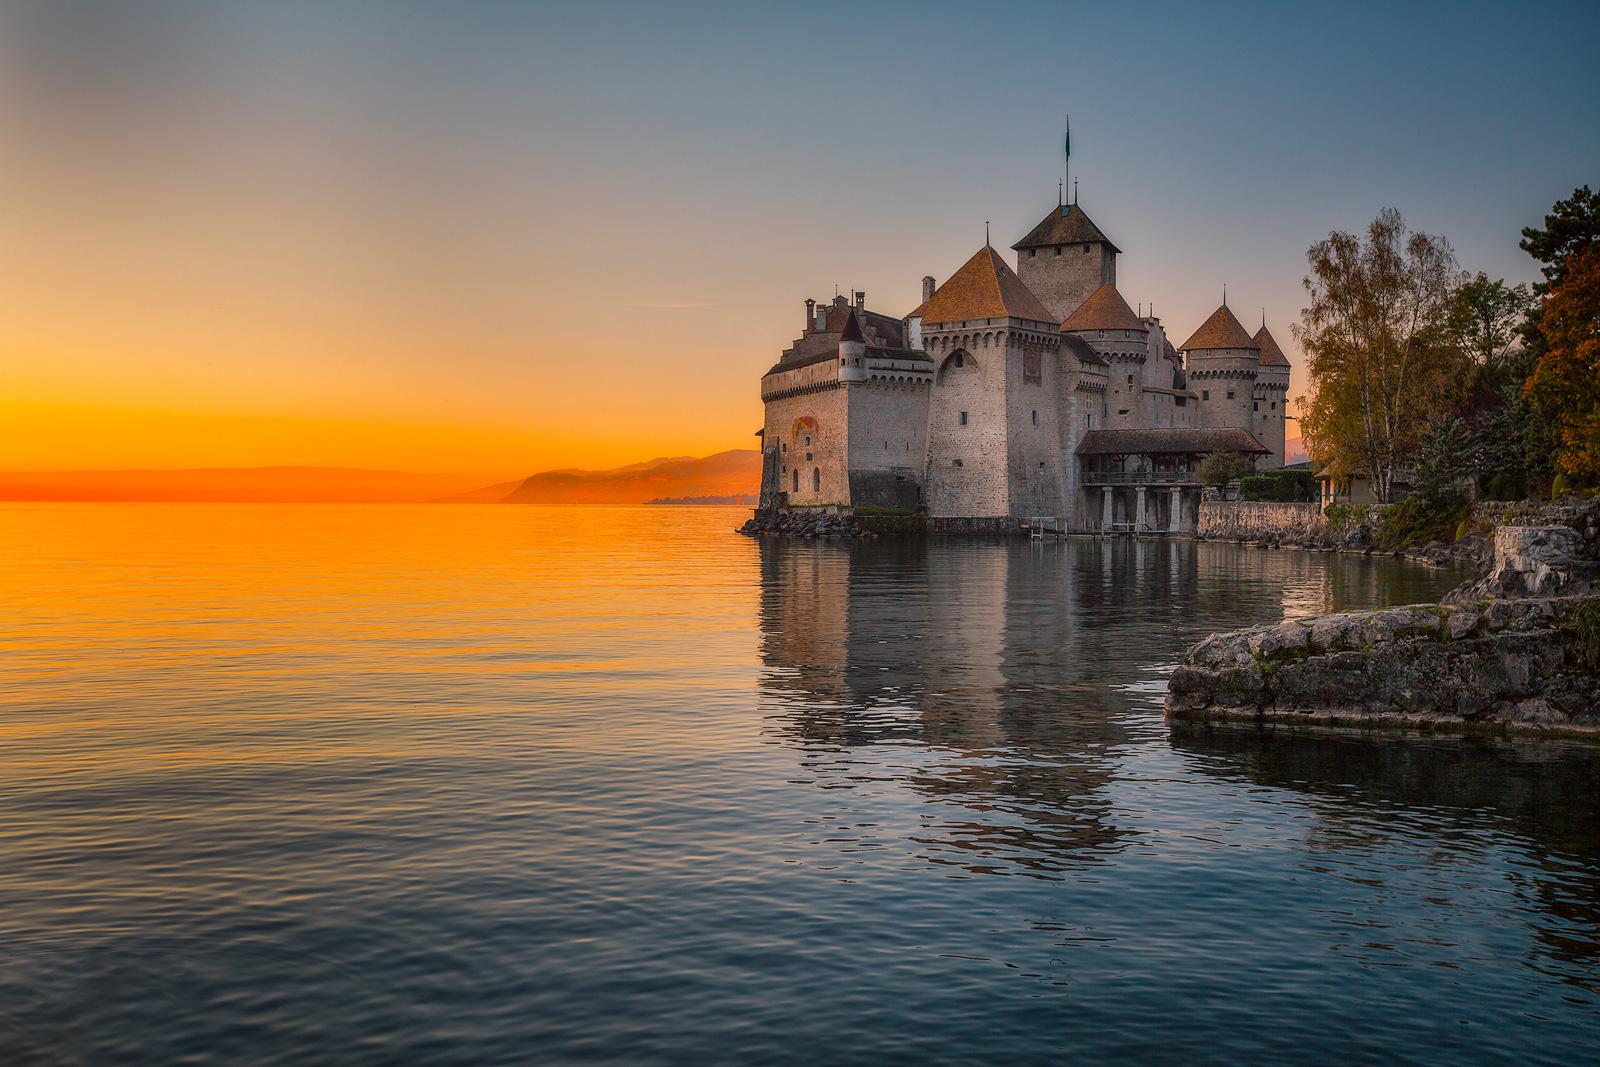 Cloudless sunset behind Switzerland's Chillon Castle